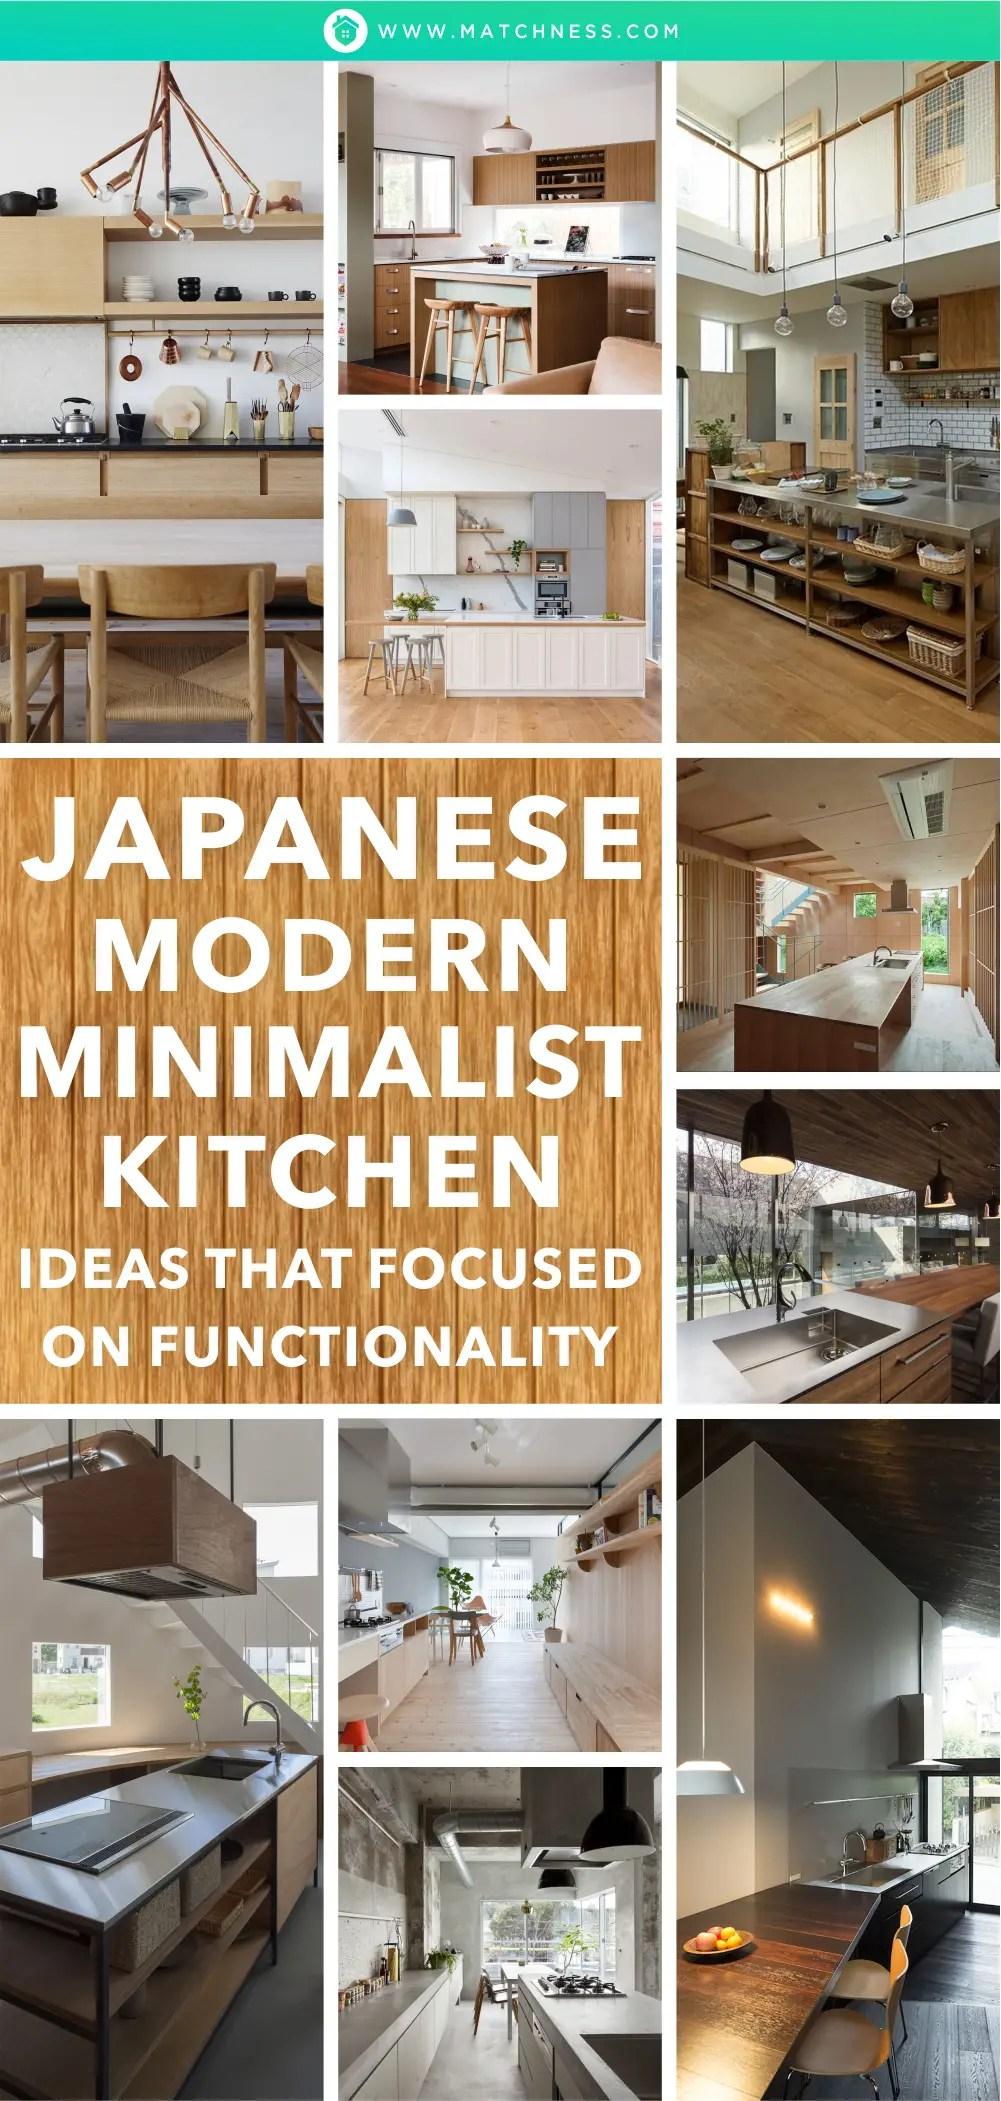 Japanese-modern-minimalist-kitchen-ideas-that-focused-on-functionality1